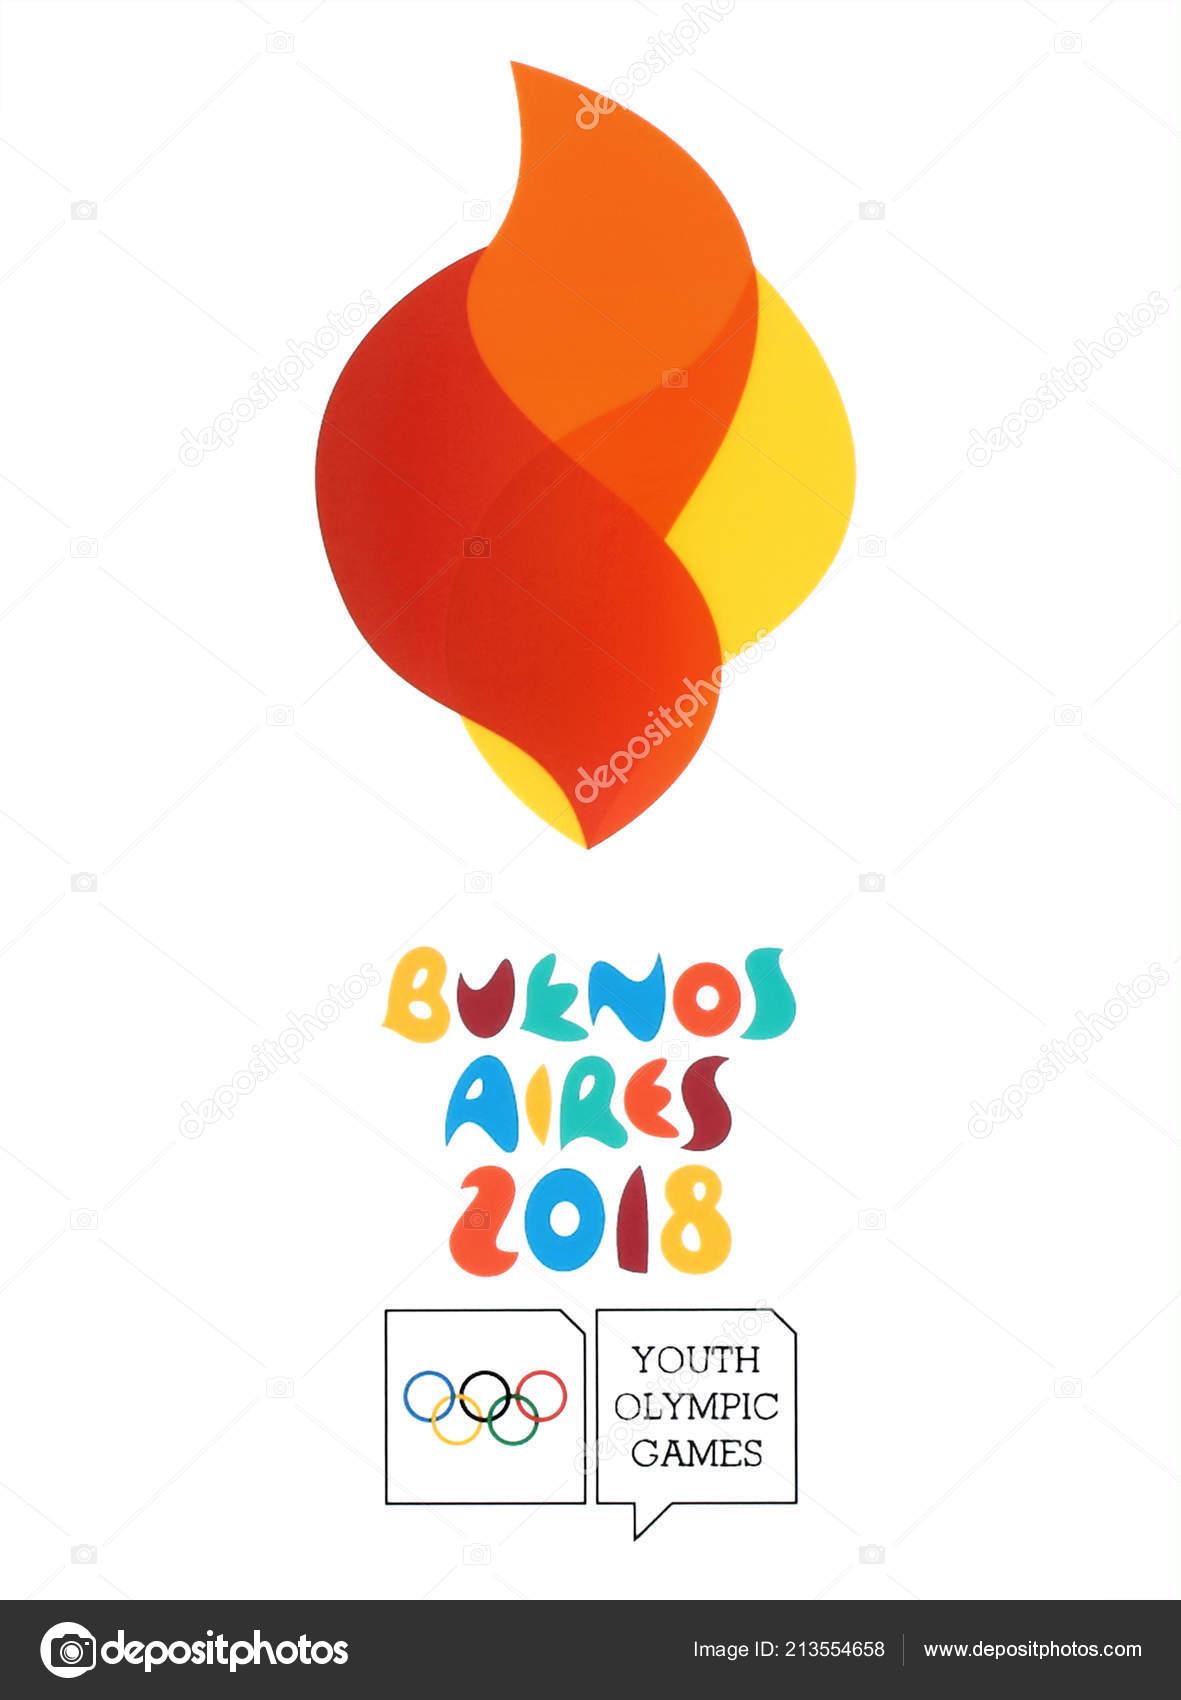 Kiev Ucrania Agosto 2018 Logo Buenos Aires 2018 Impresos Papel